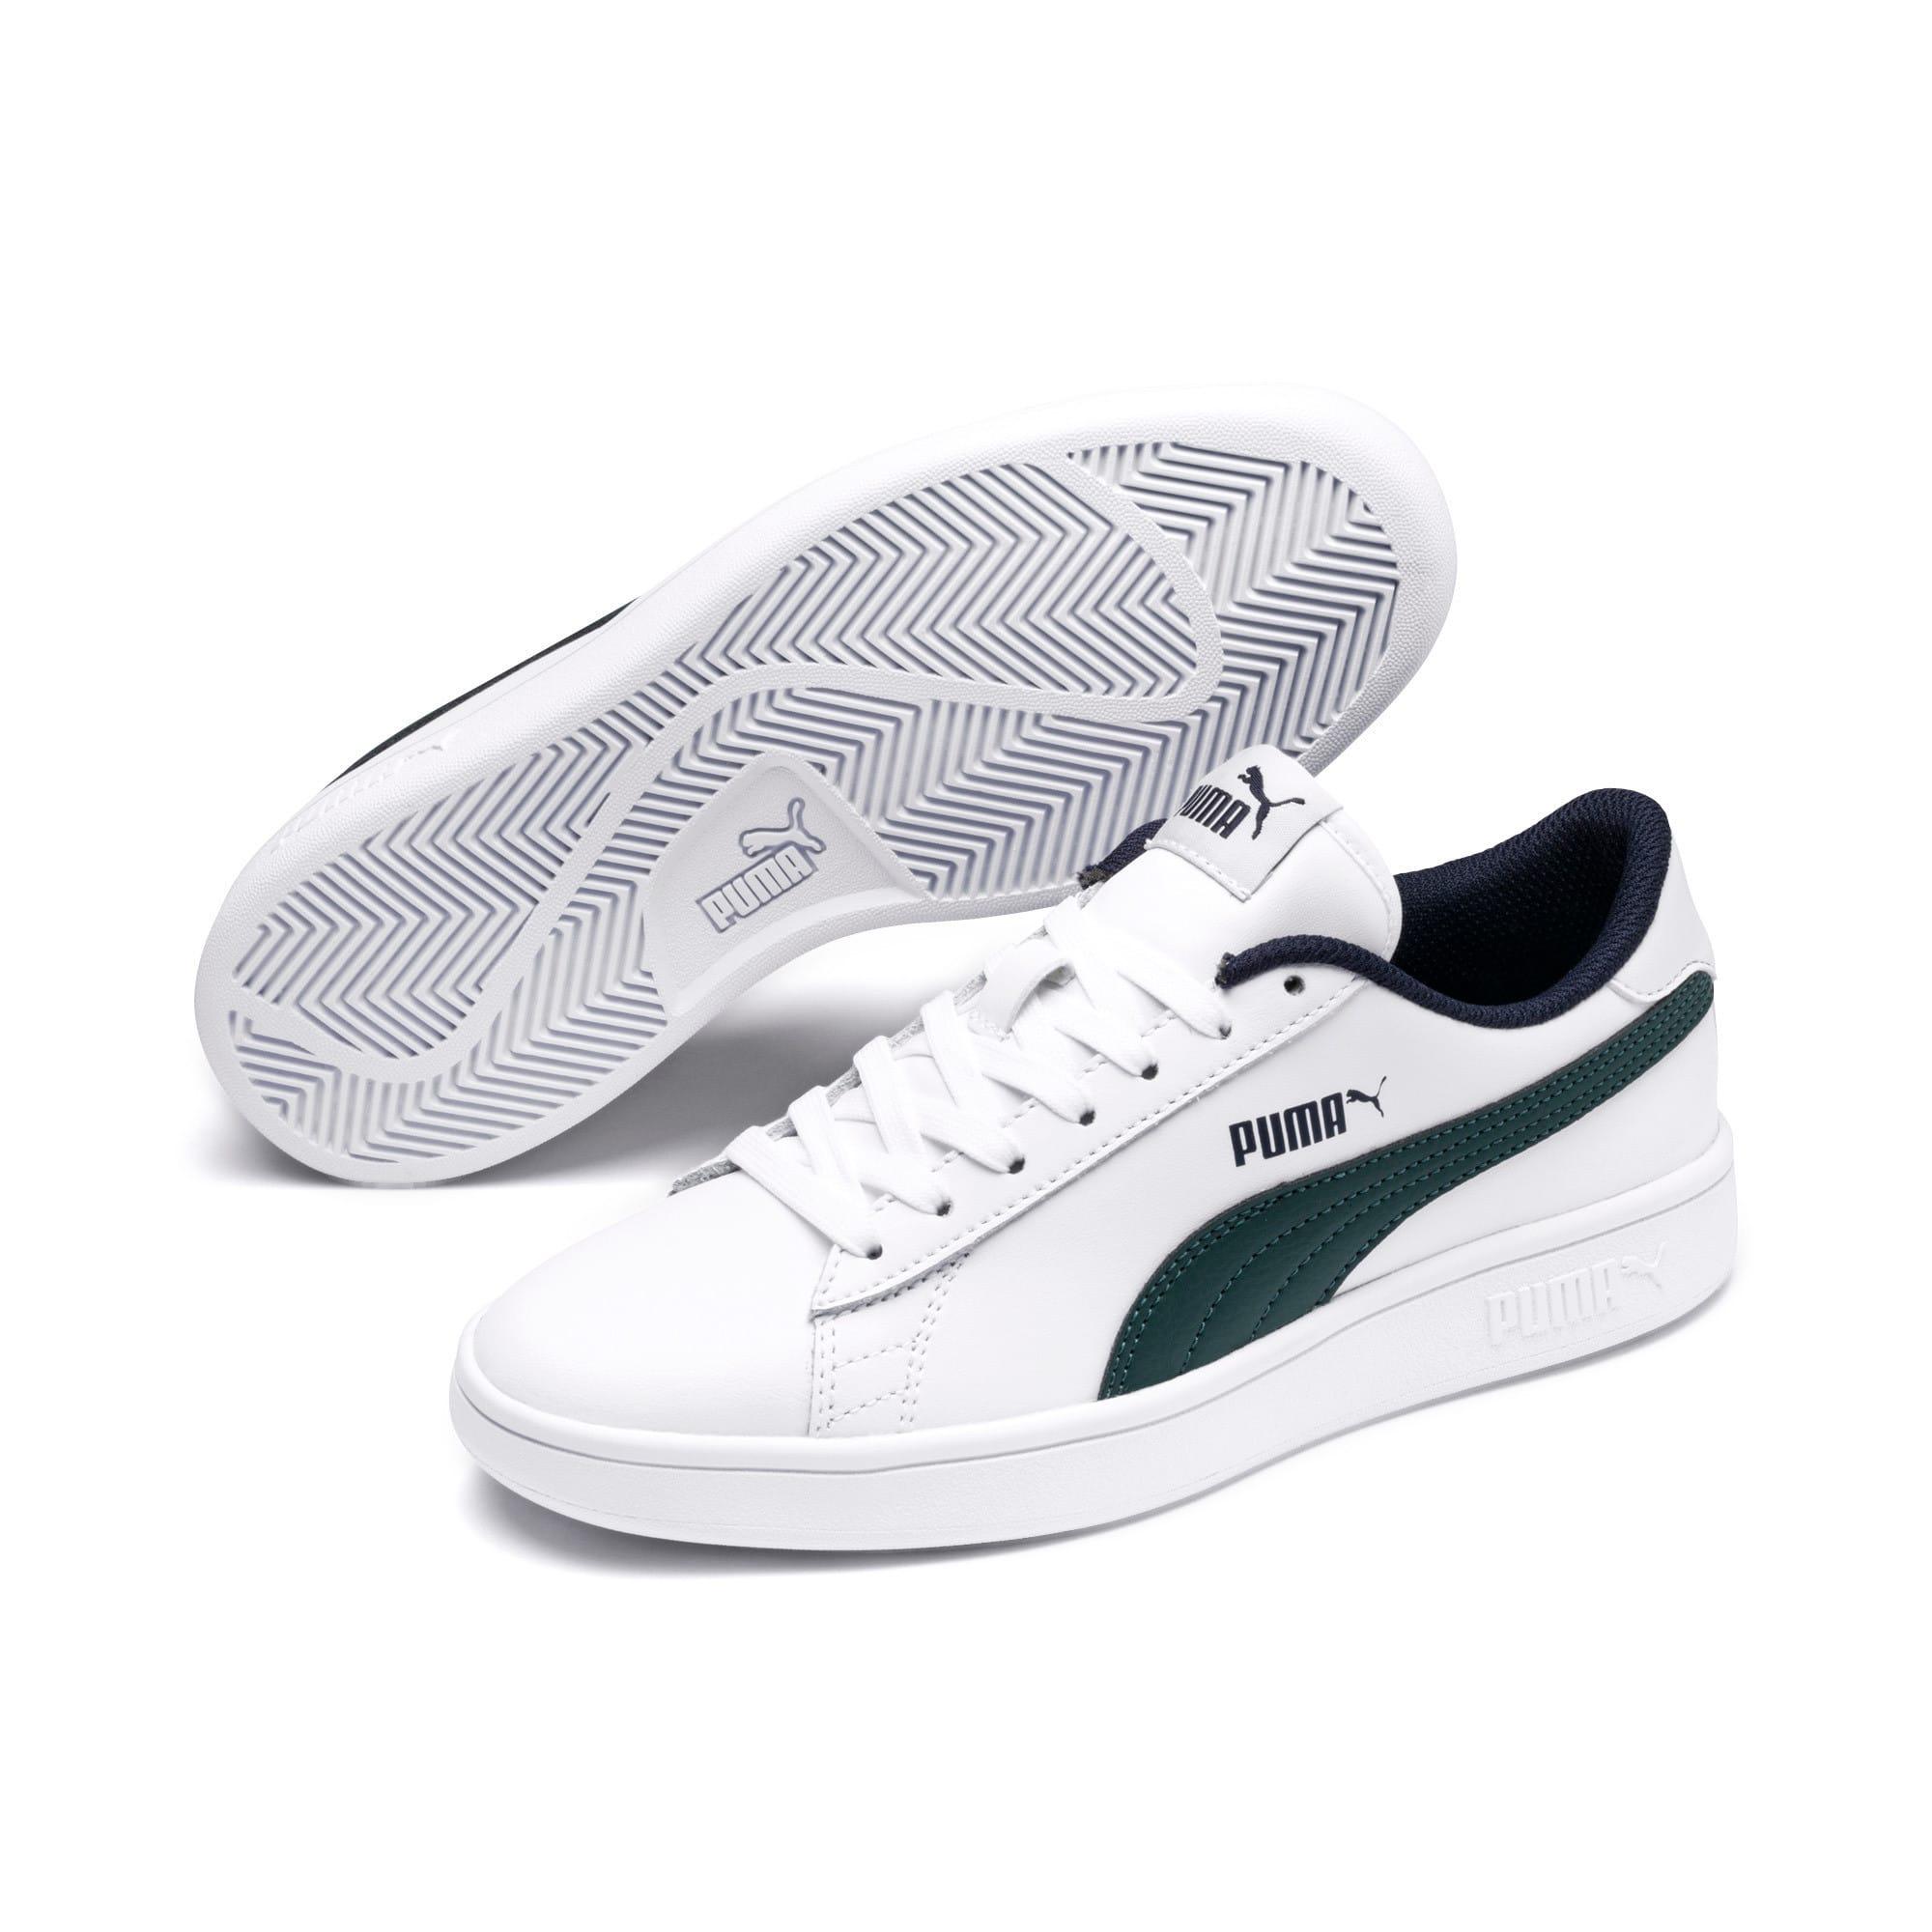 Thumbnail 2 of PUMA Smash v2 Youth Sneaker, Puma White-Ponderosa Pine, medium